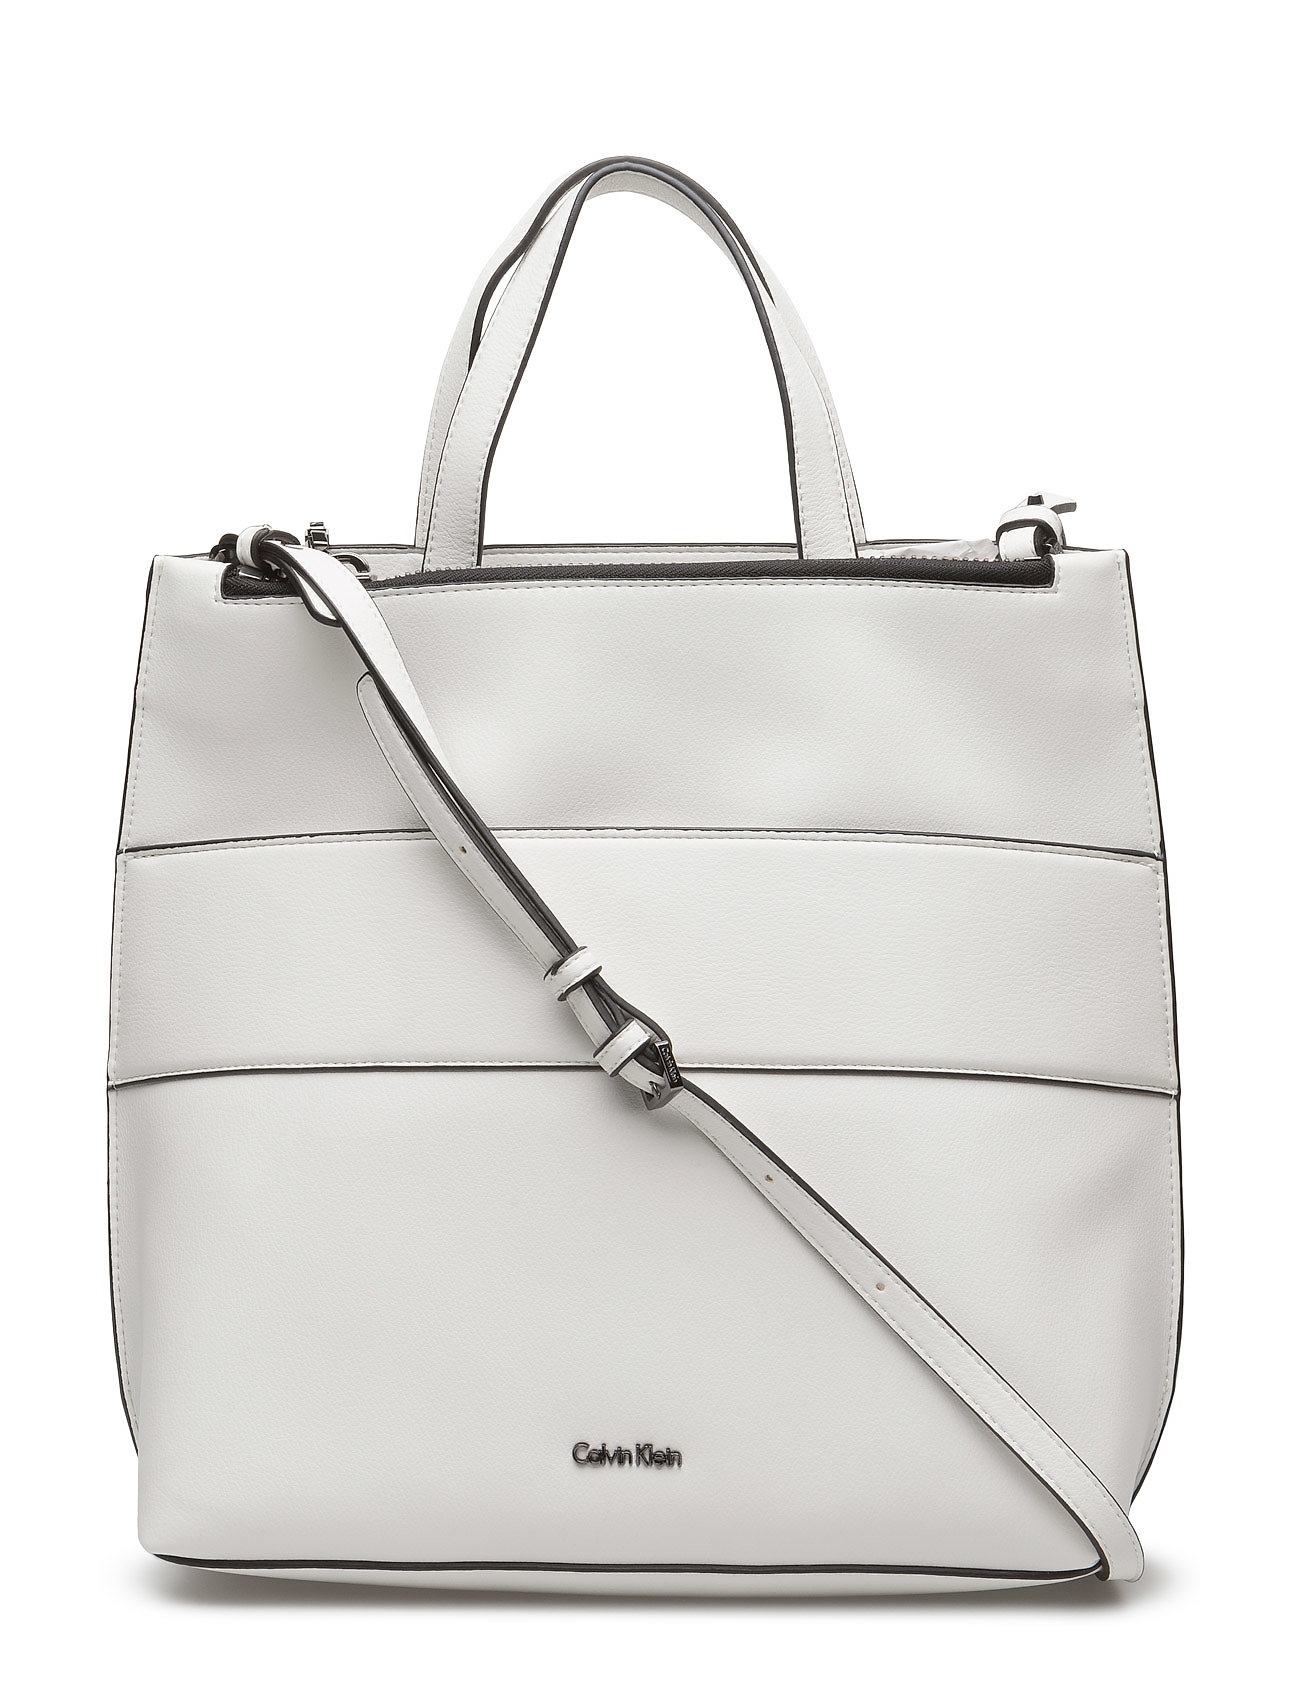 Luc7 Ns Tote 001, Os Calvin Klein Shopper tasker til Damer i